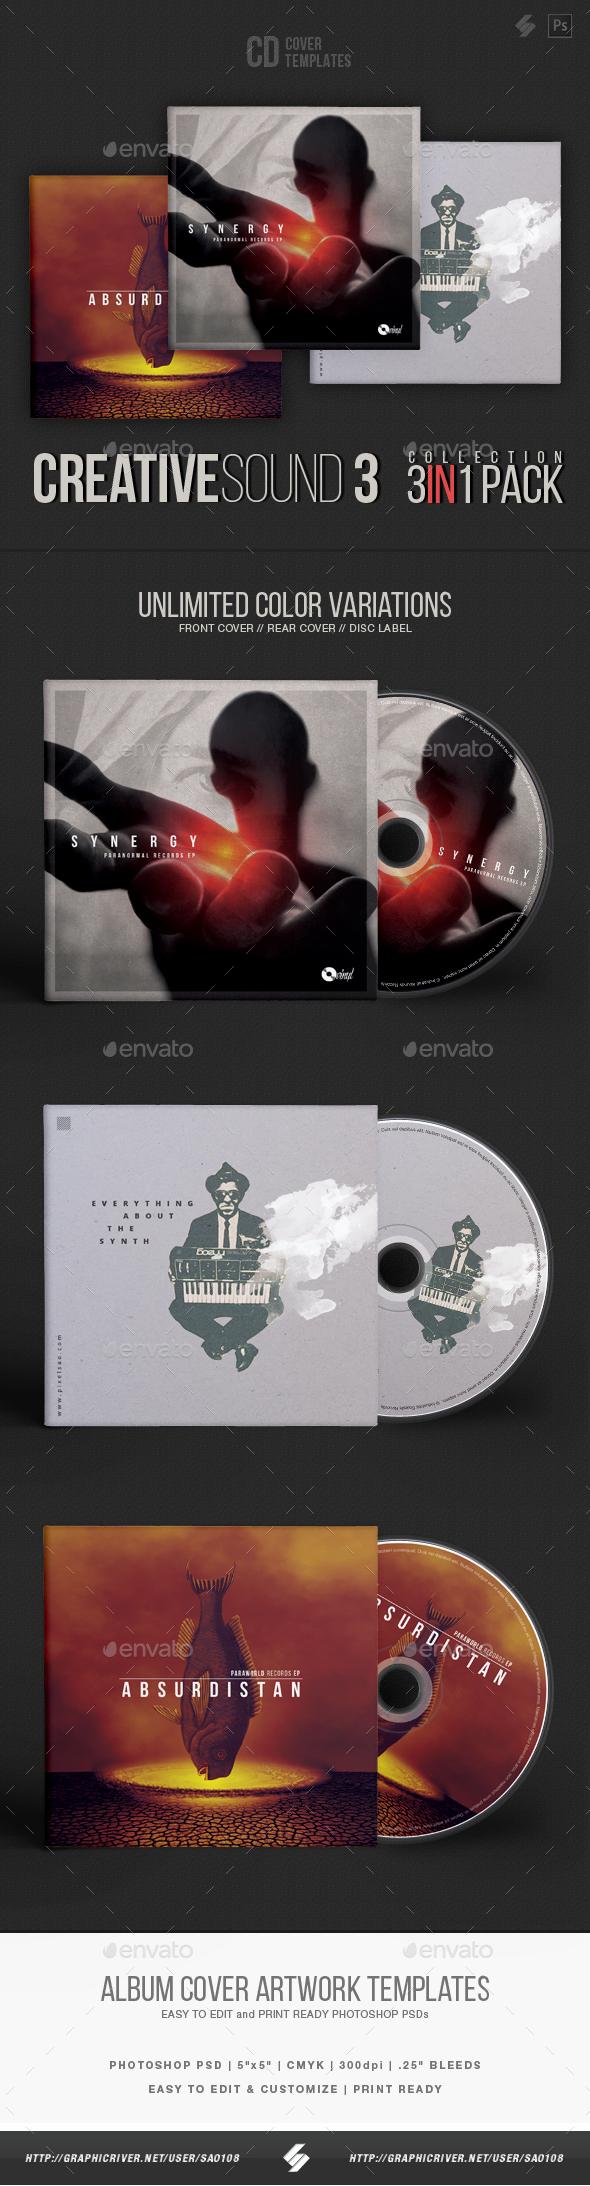 Creative Sound Collection 3 - CD Cover Artwork Templates Bundle - CD & DVD Artwork Print Templates